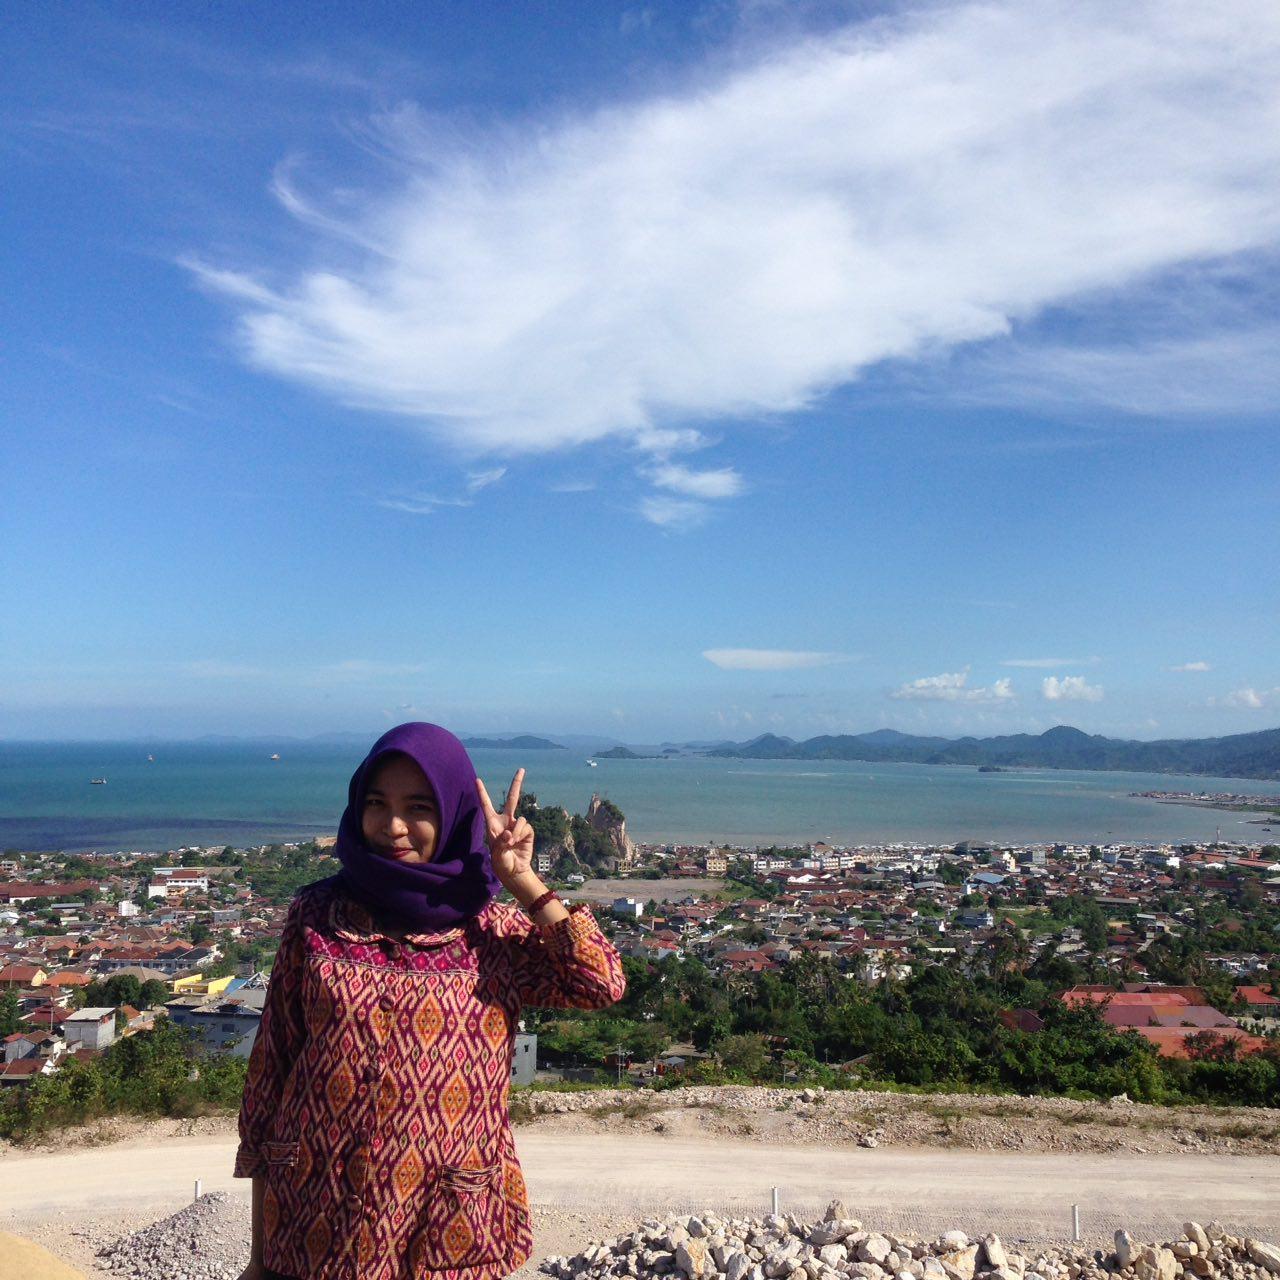 Objek Wisata Kota Bandar Lampung Creative City Forum Taman Hutan